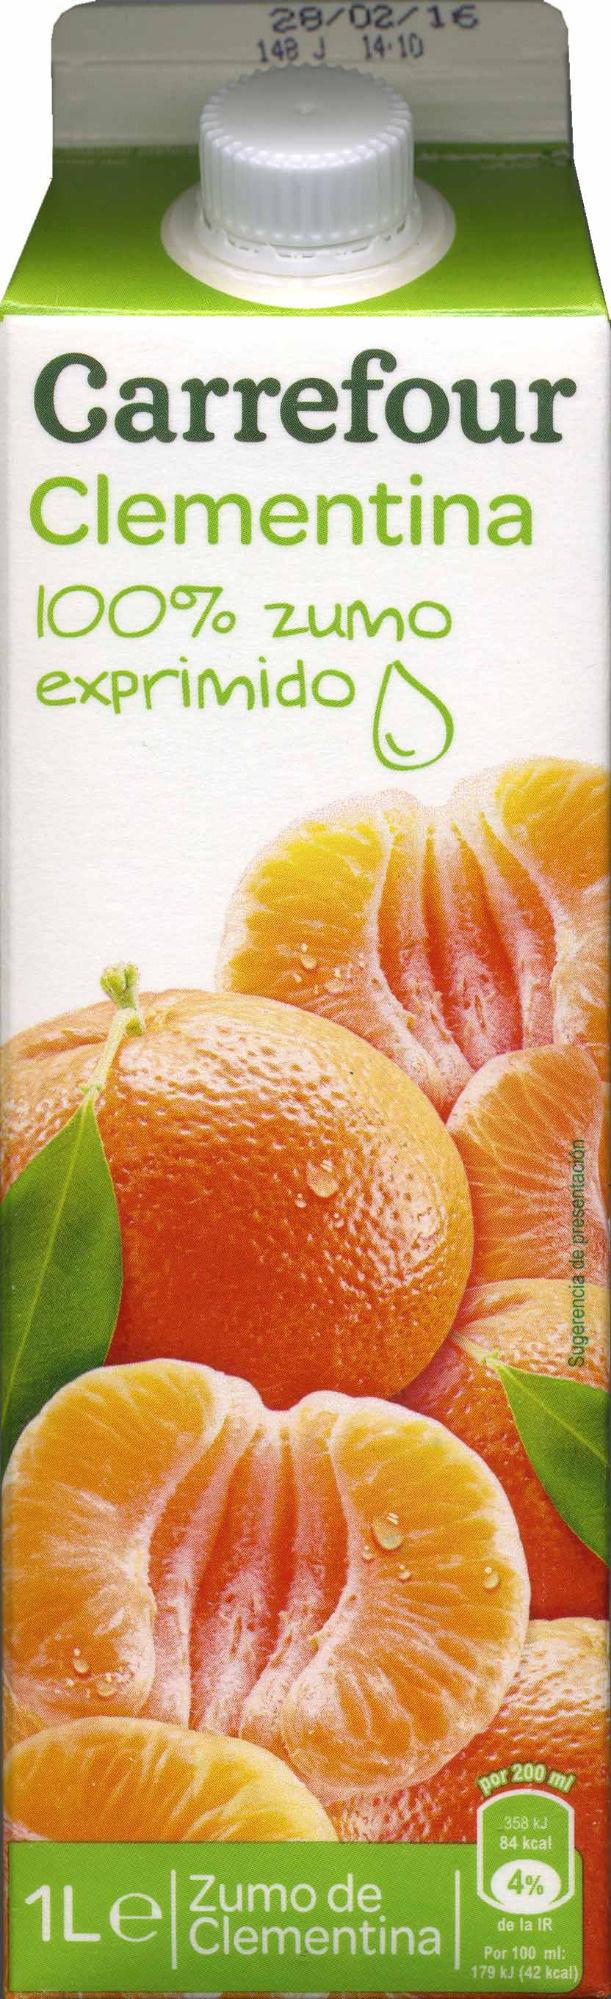 Zumoclementina100% exprimido - Producto - es